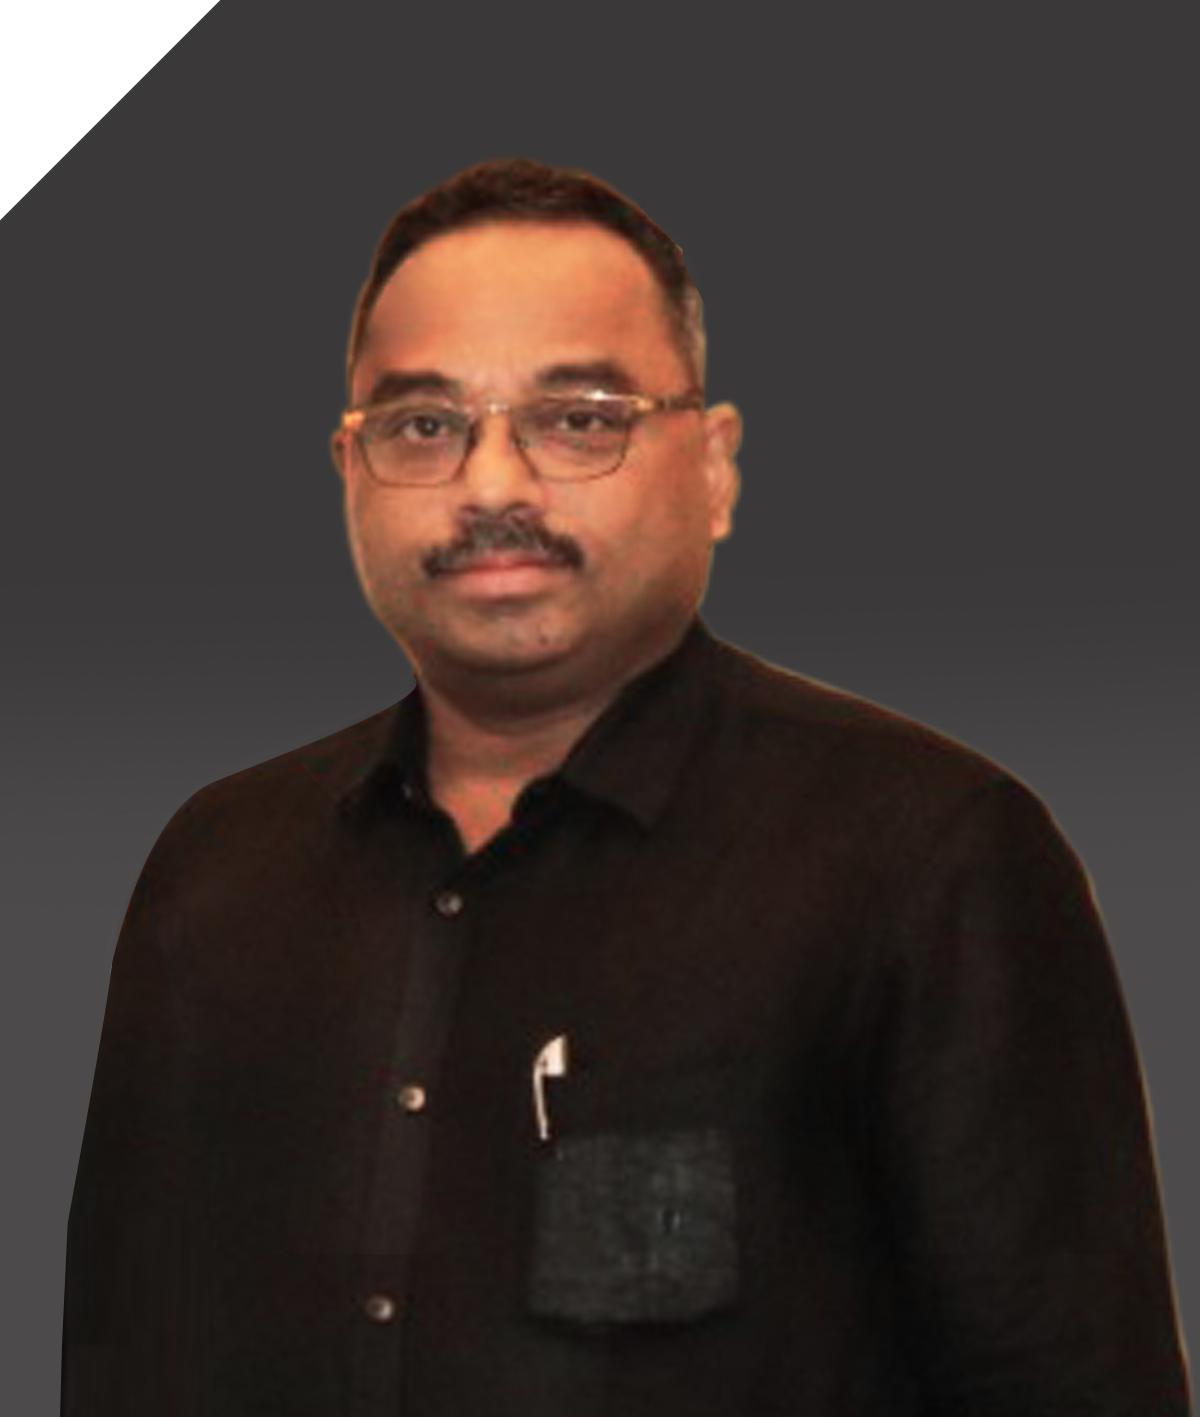 https://alershadgroup.com/wp-content/uploads/2020/09/Rajagopal.jpg